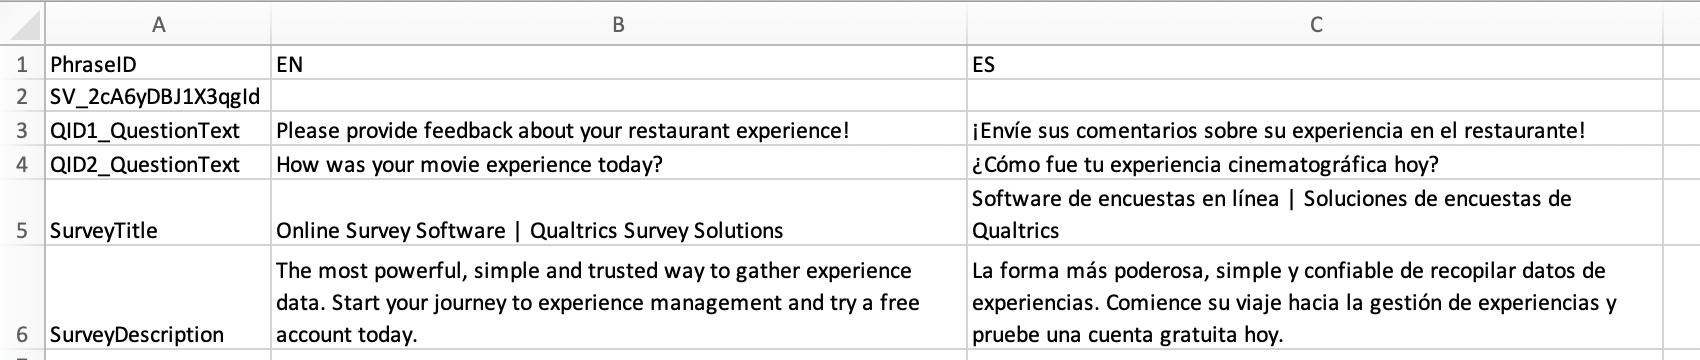 CSV of translation file